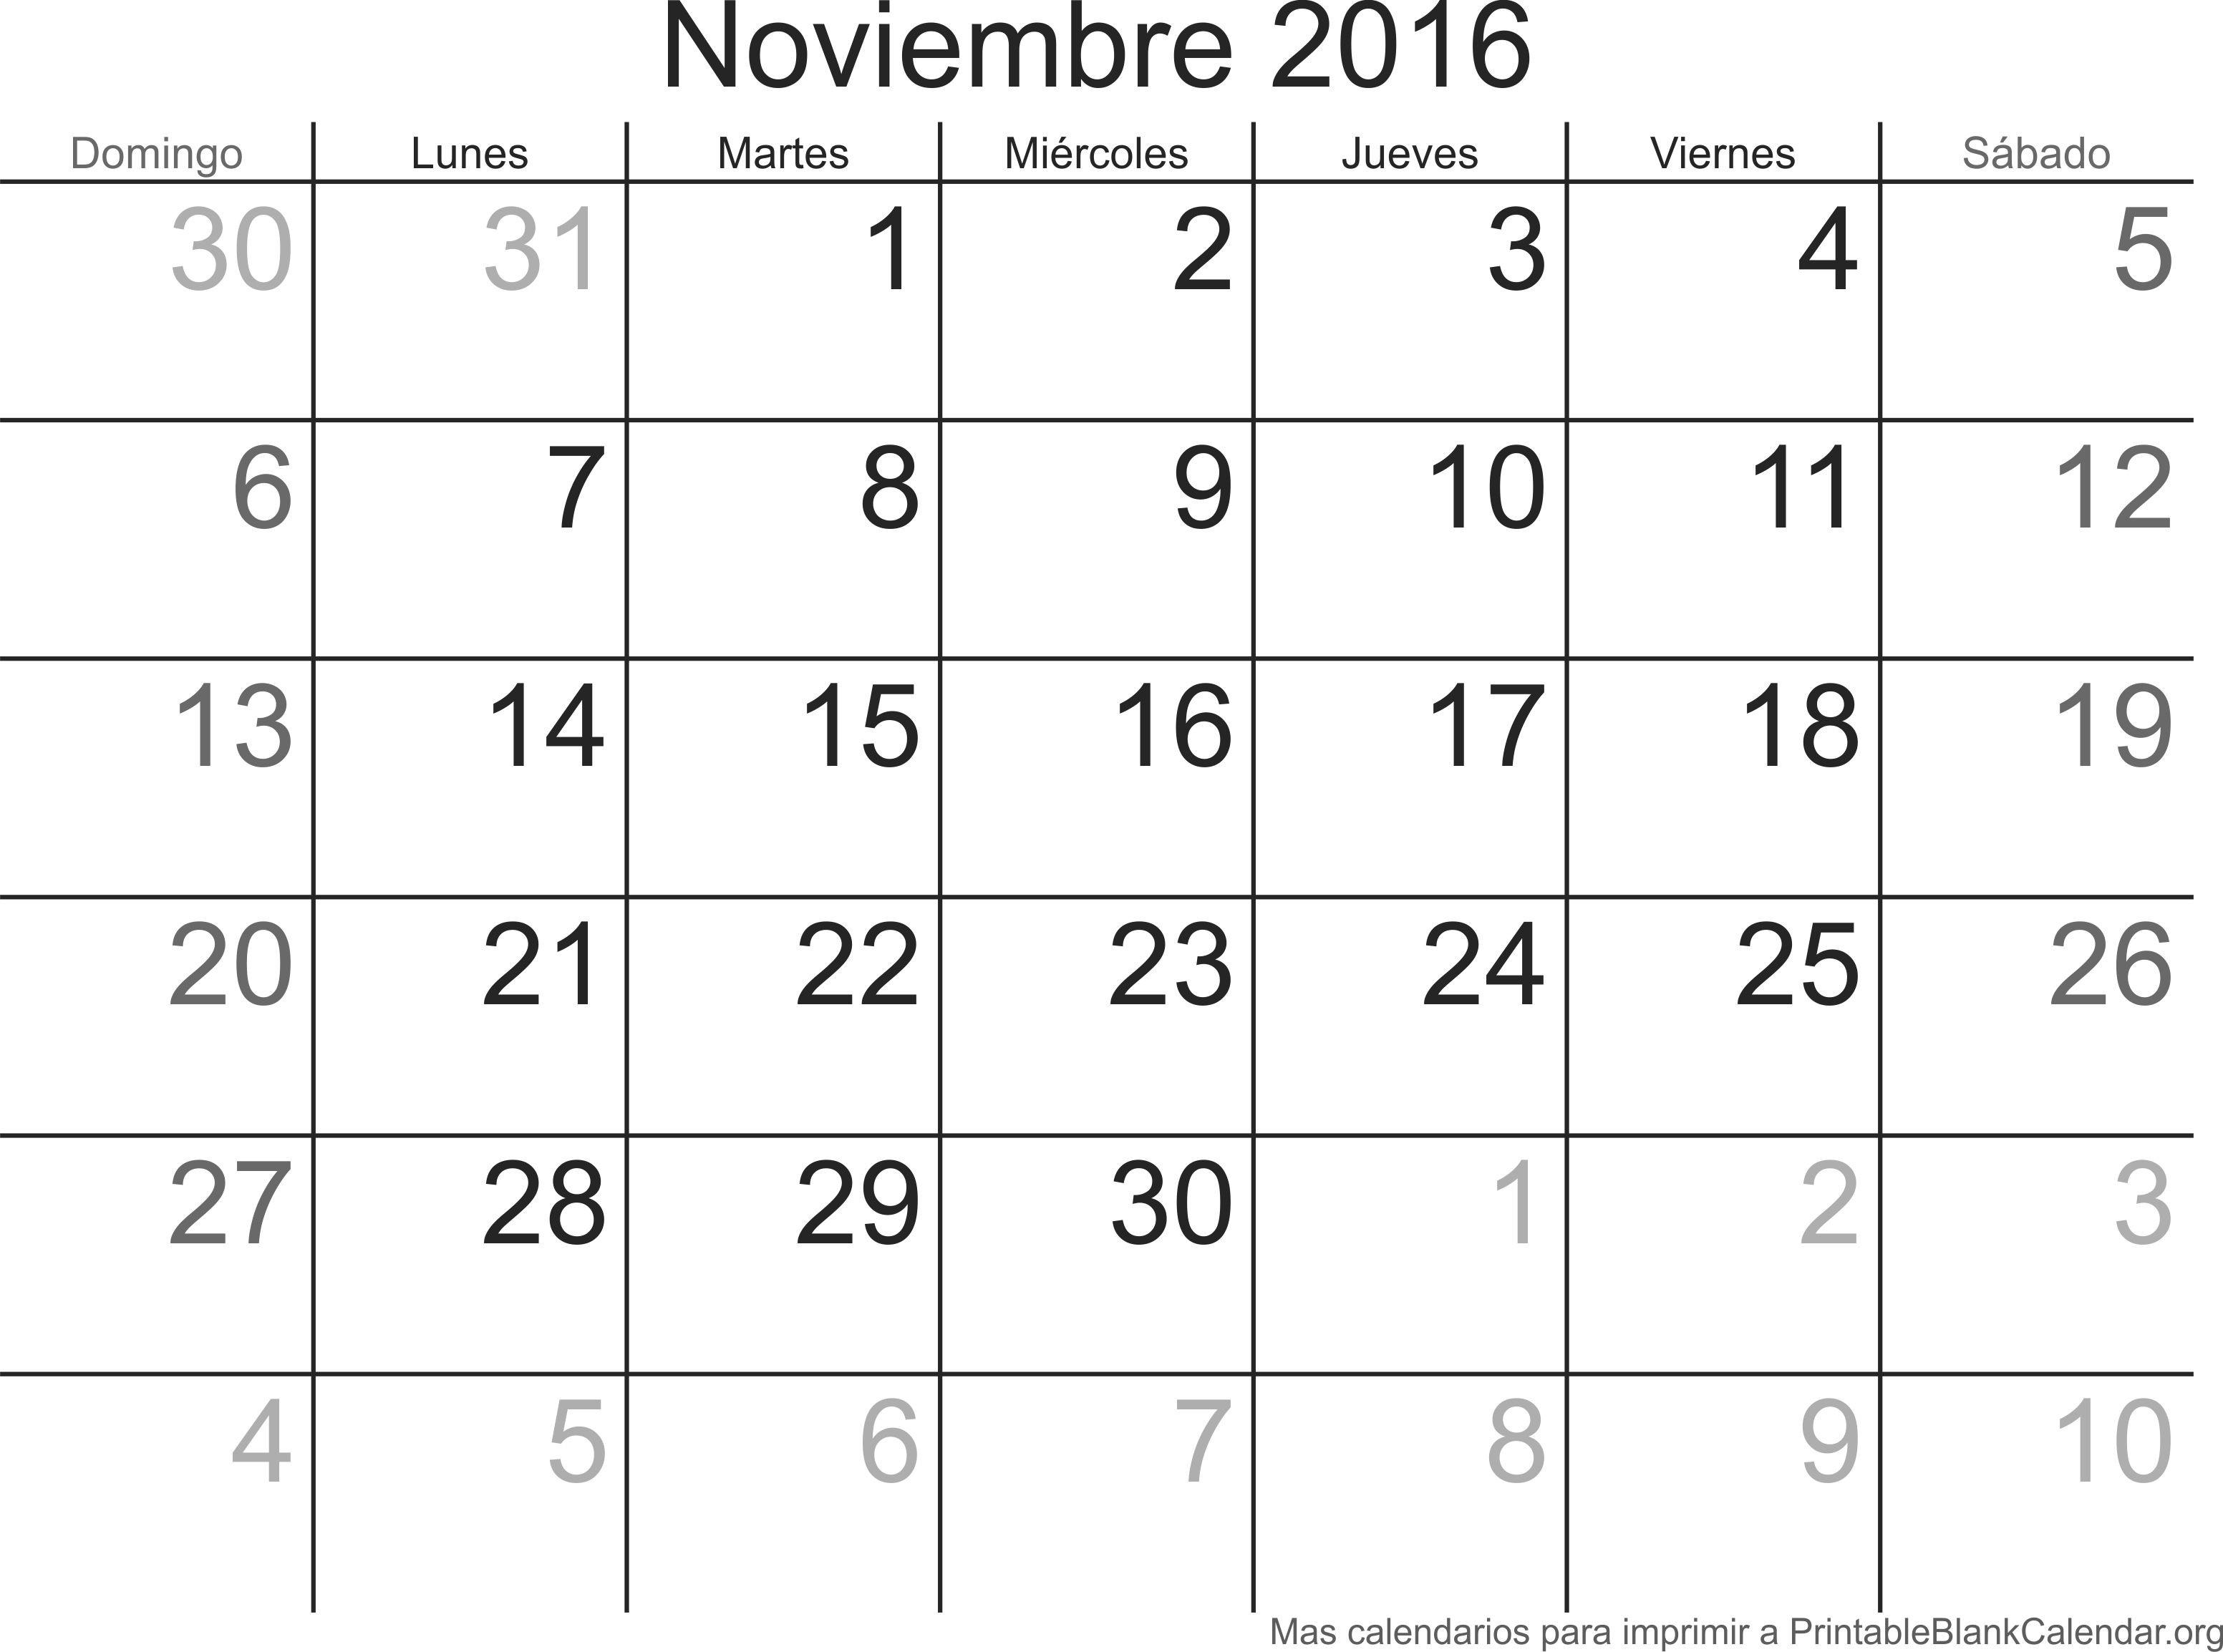 Noviembre 2016